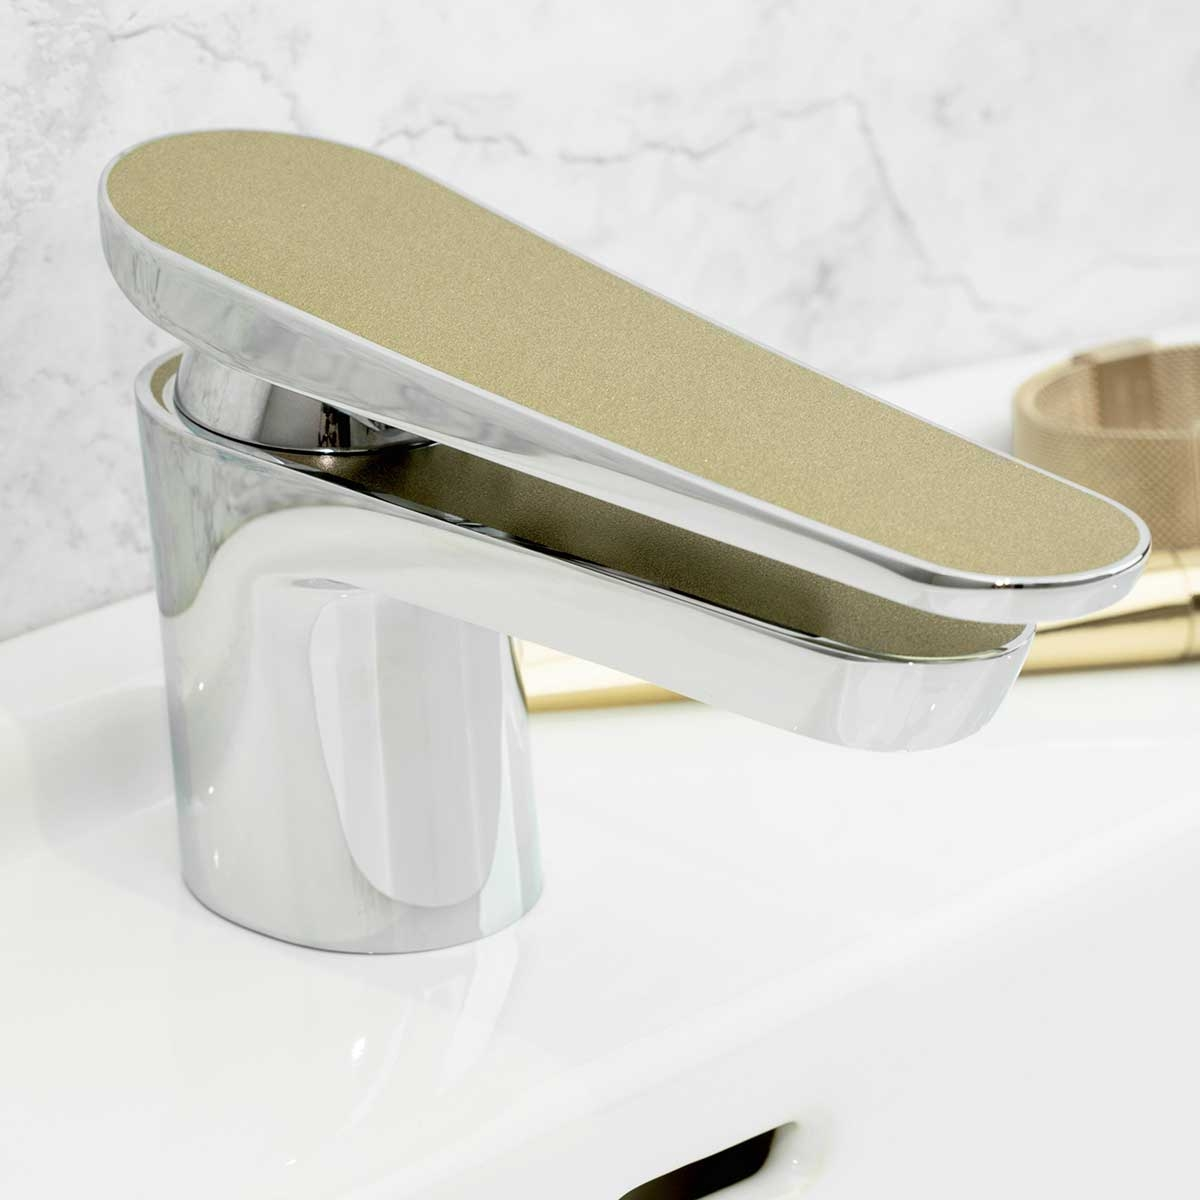 Bristan Metallix Claret Basin Mixer Tap - Champagne Shimmer-0